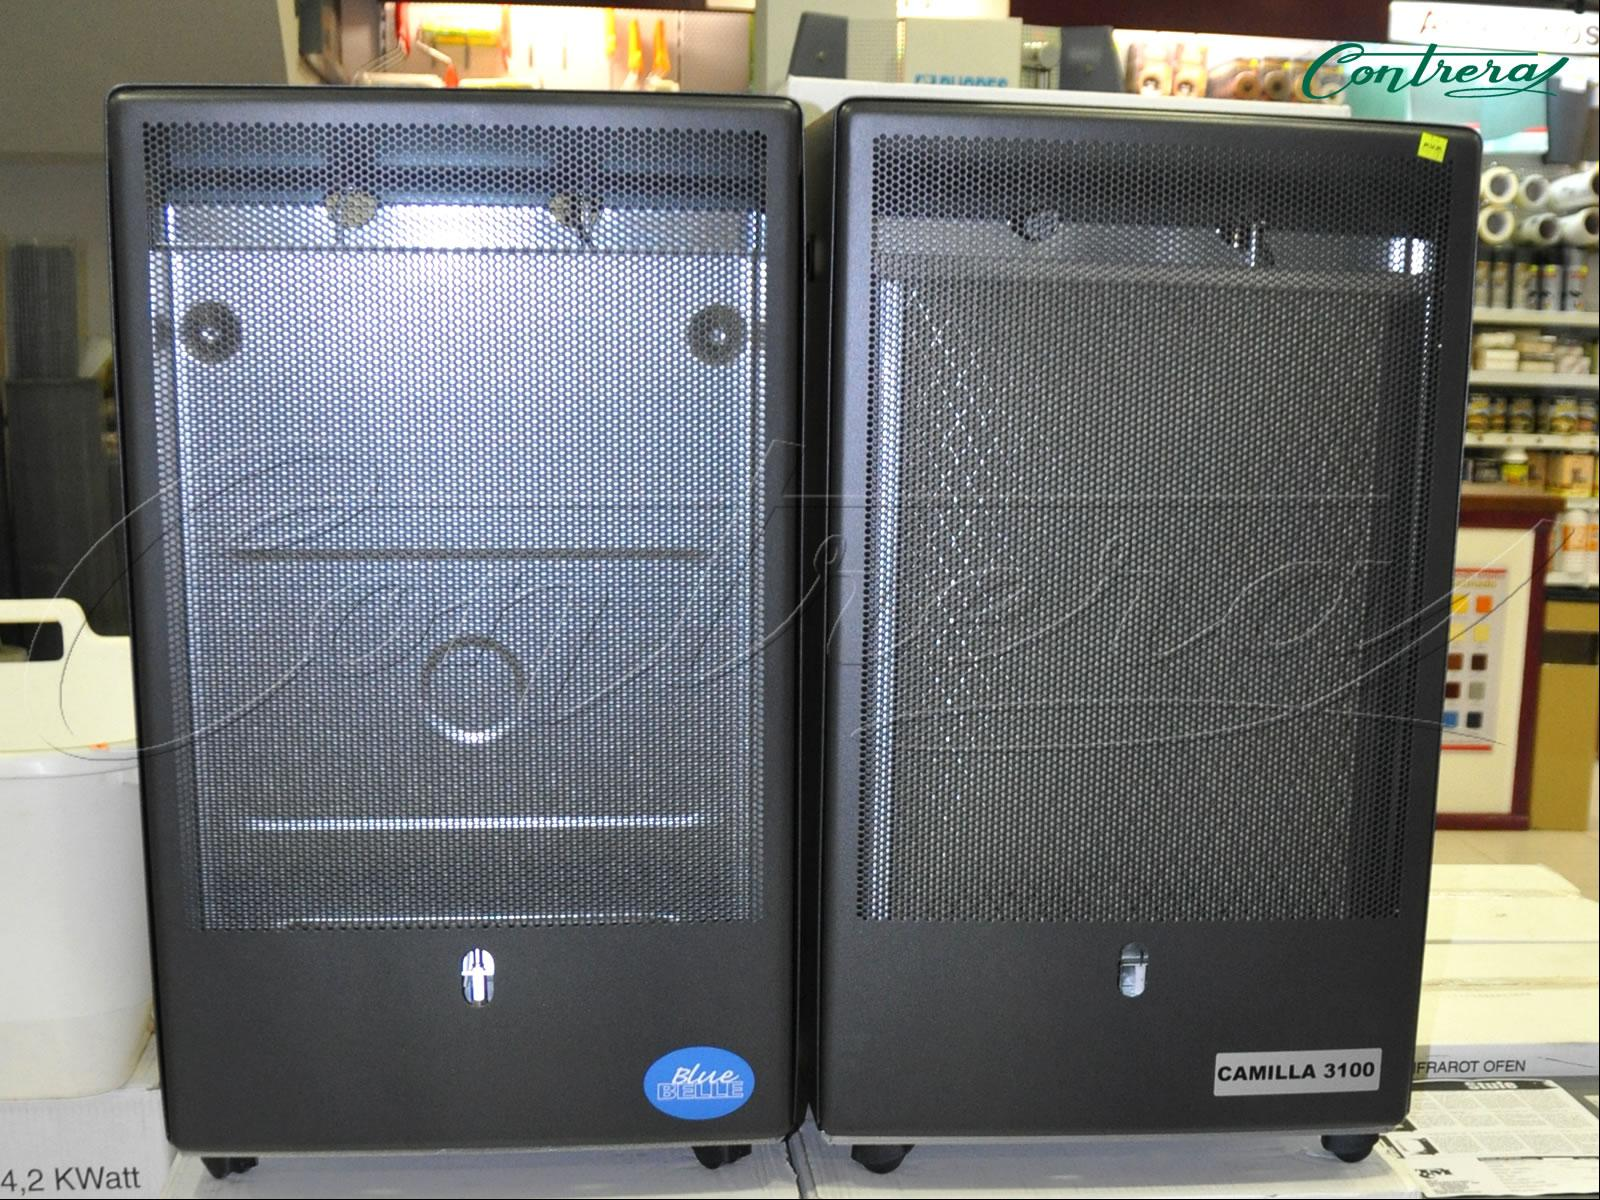 Estufas radiadores for Estufa lena calefaccion radiadores